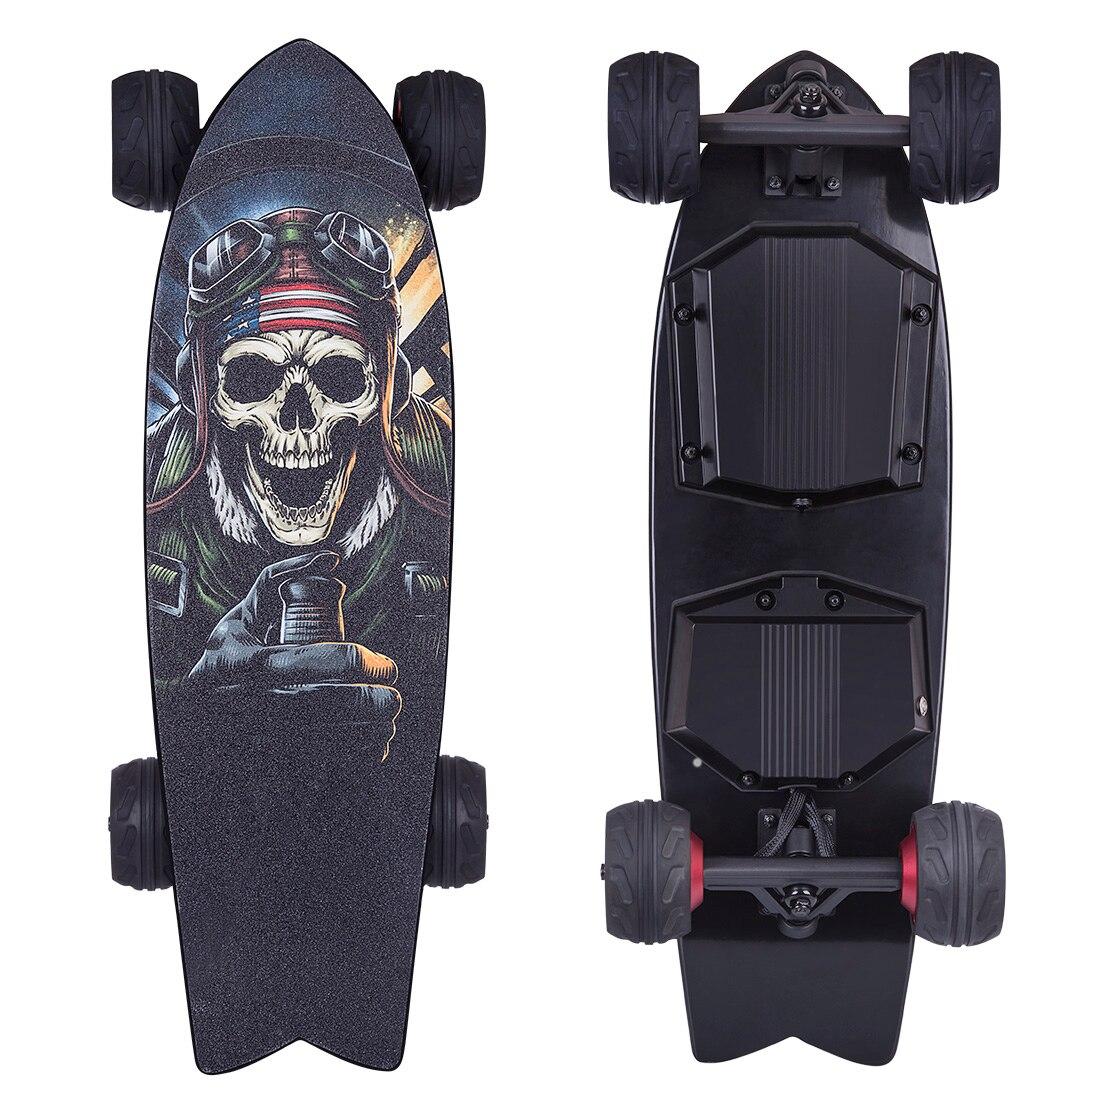 BRT03 4-Wheel Electric Skateboard Outdoor Speed Electric Scooter Frosted Board Skateboard